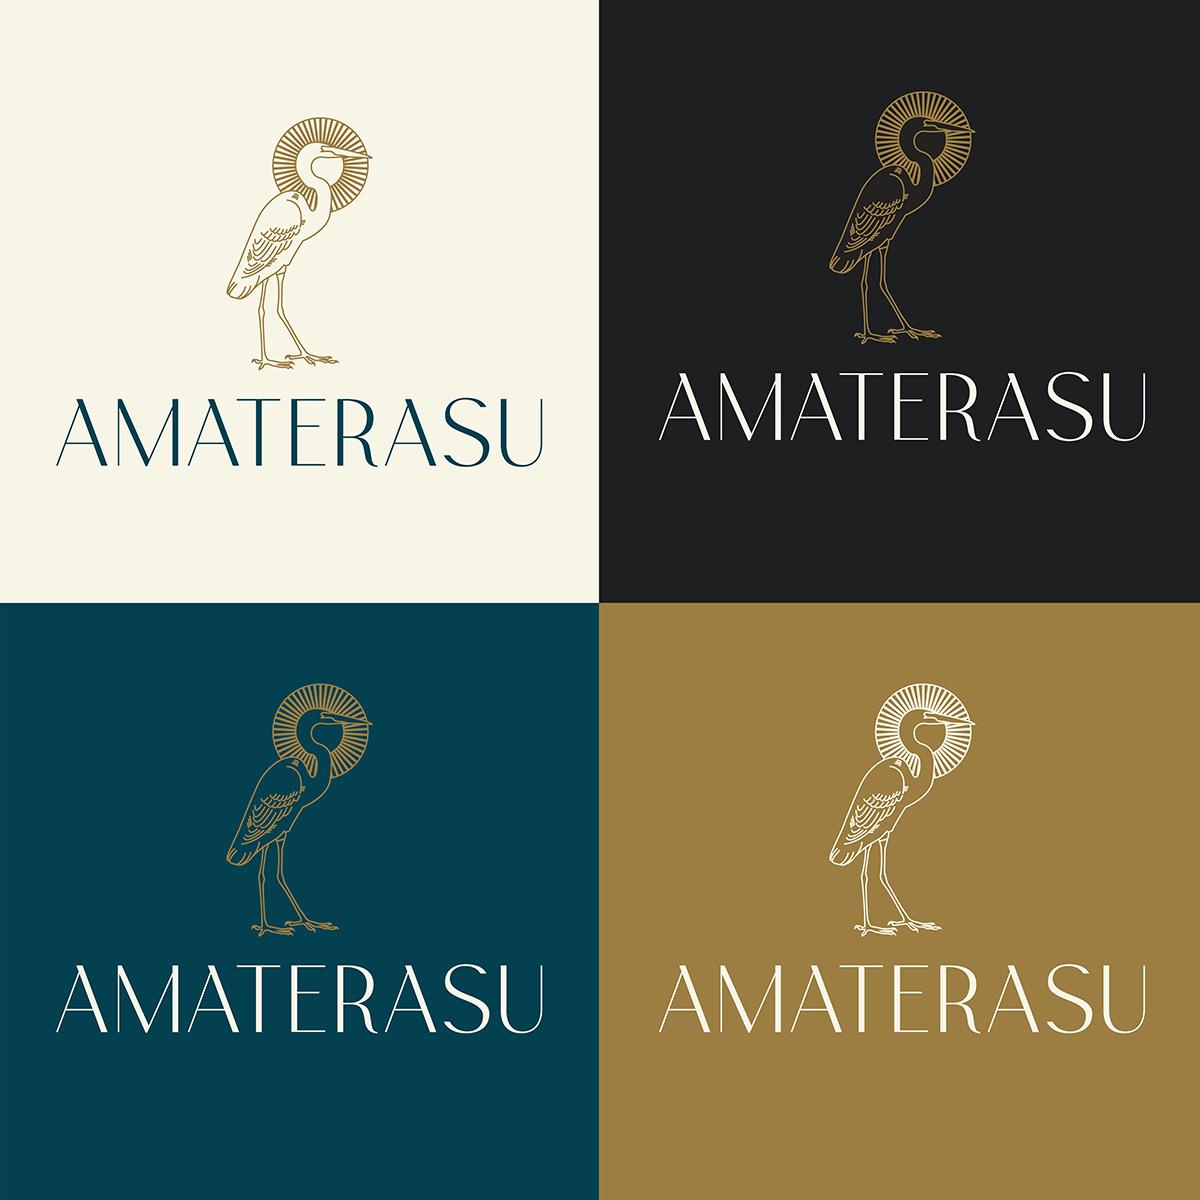 Branding for Japanese Restaurant Amaterasu